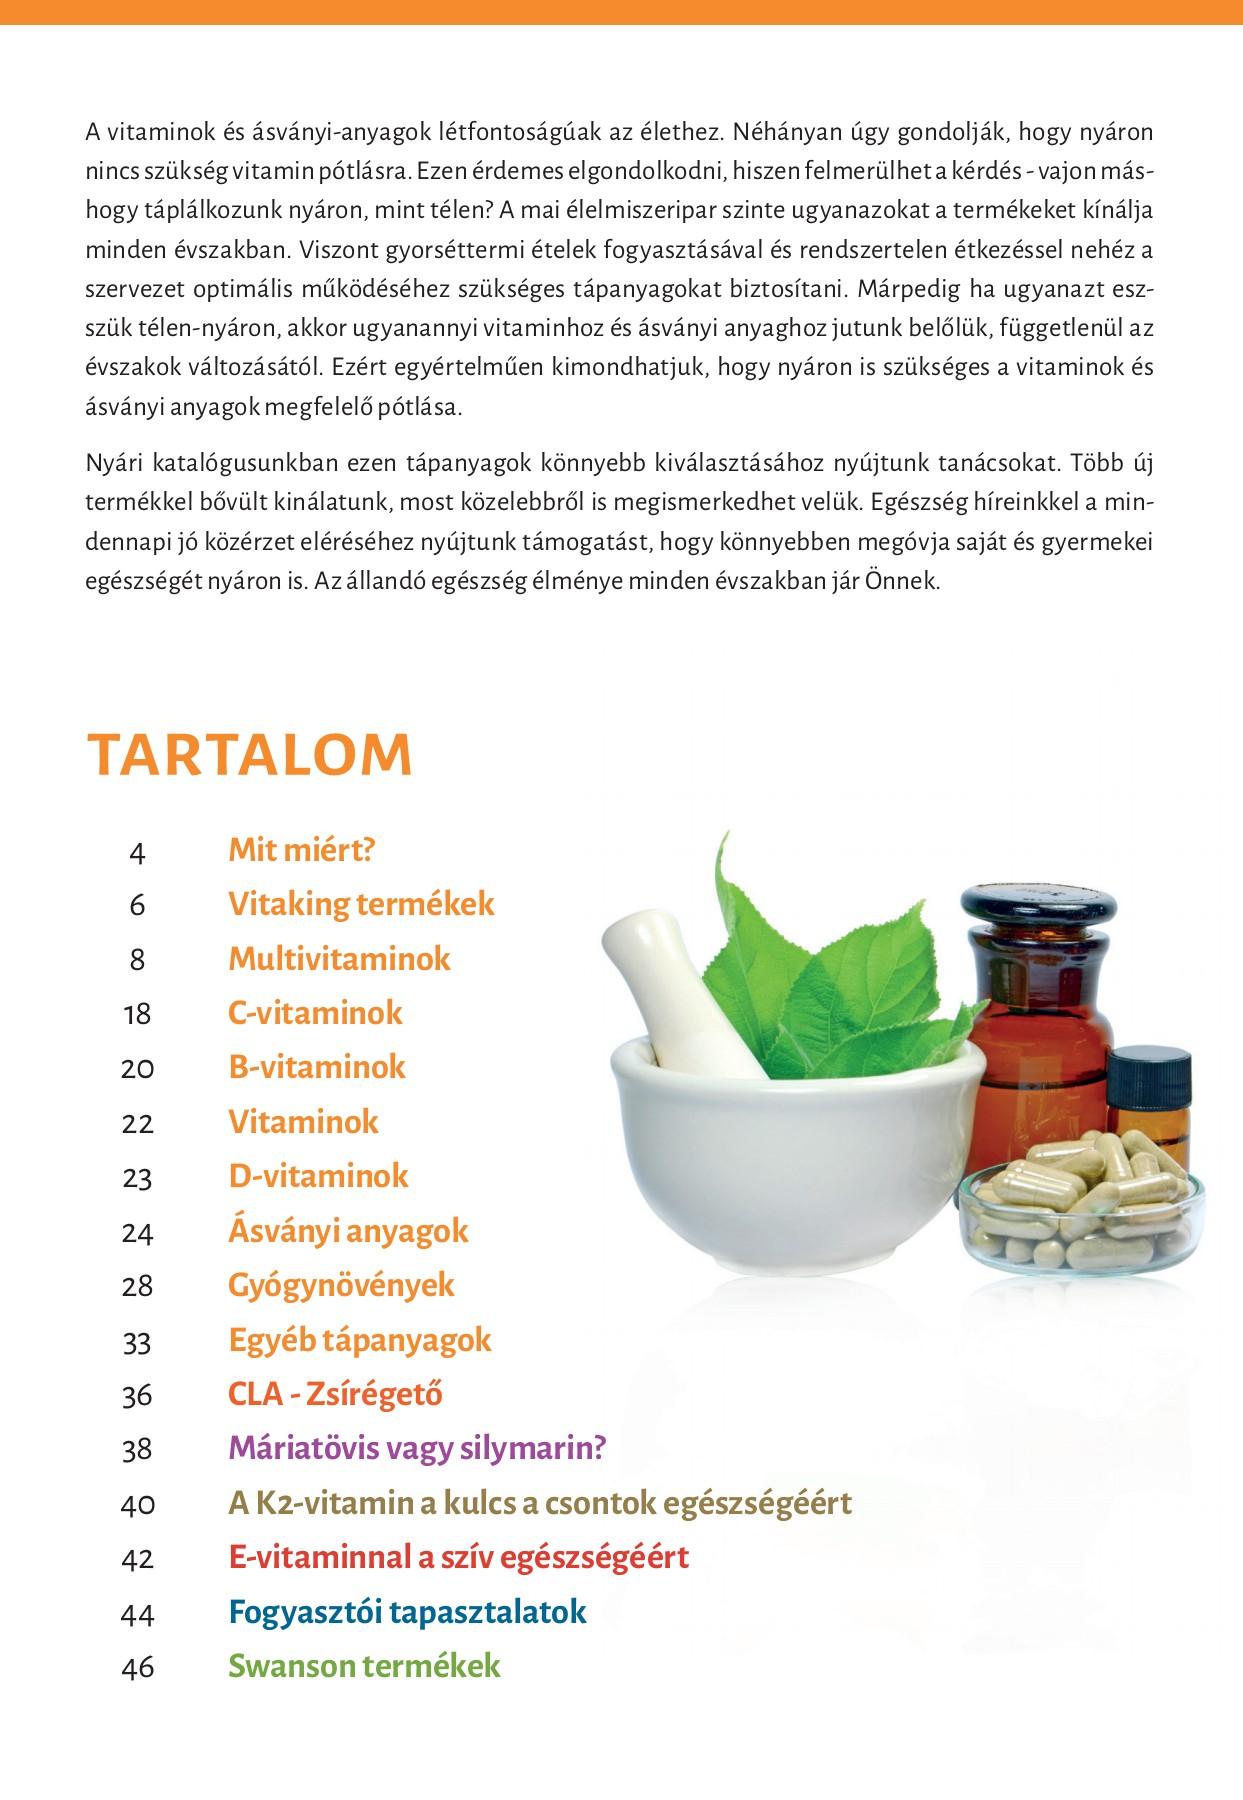 vitaminok és férgek